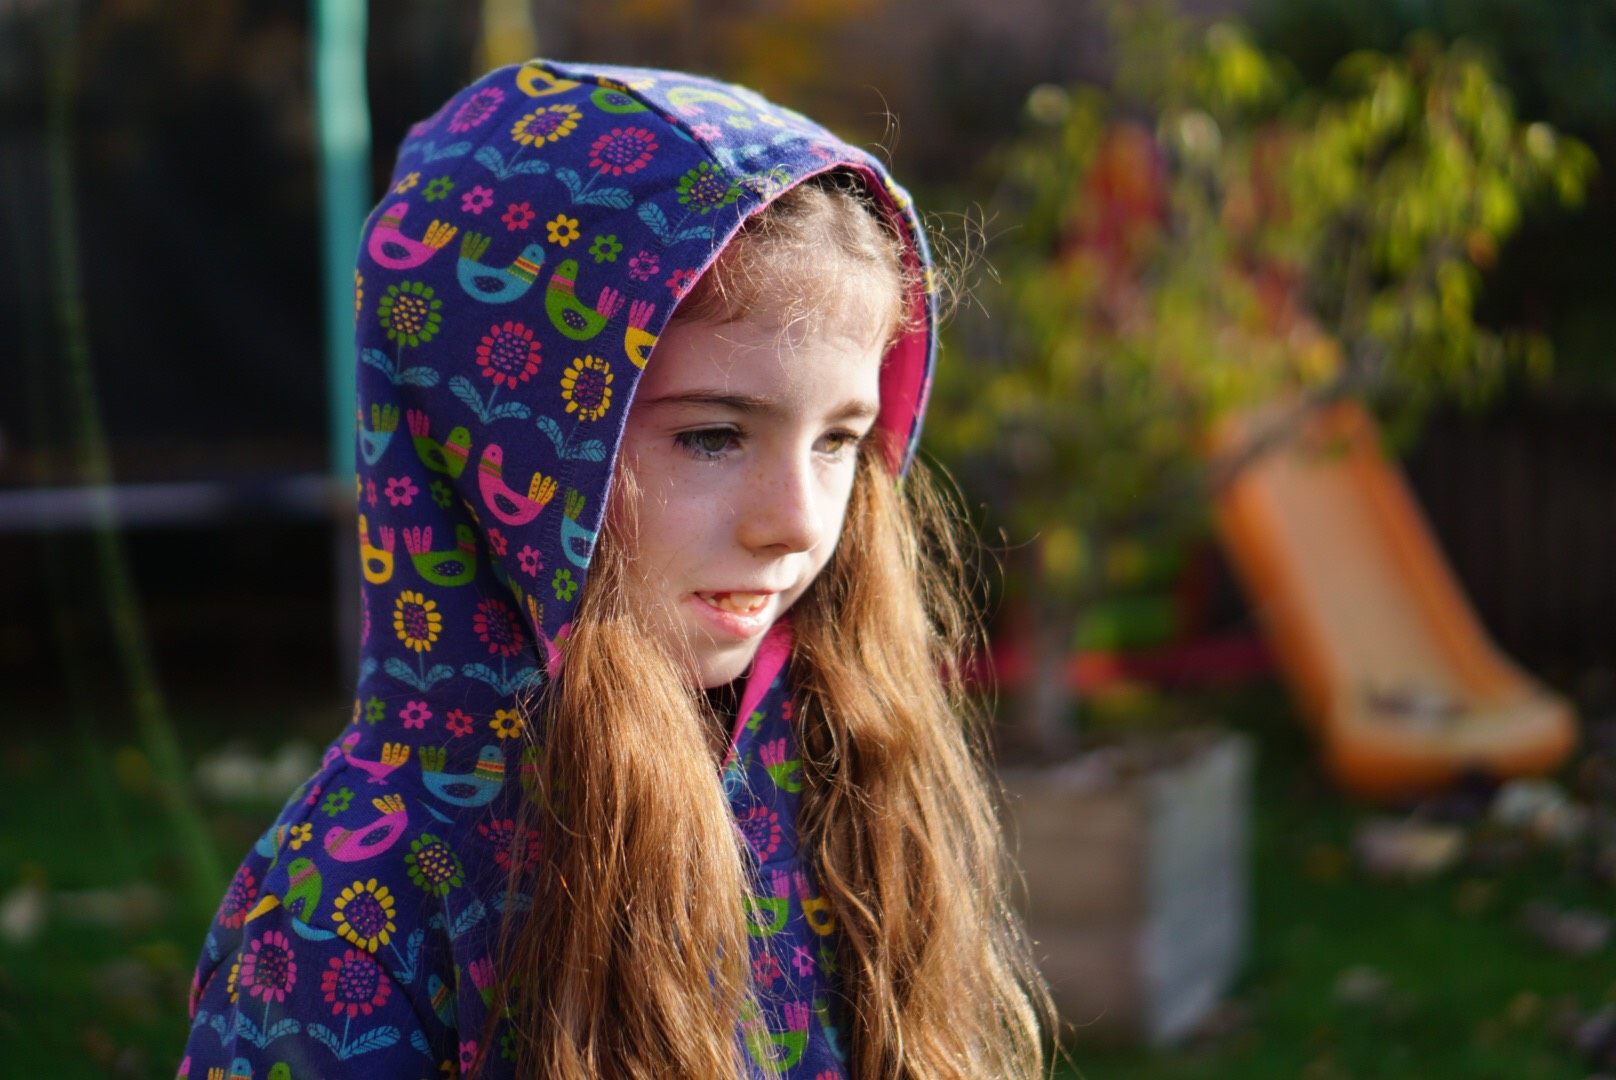 eco friendly fashion for kids